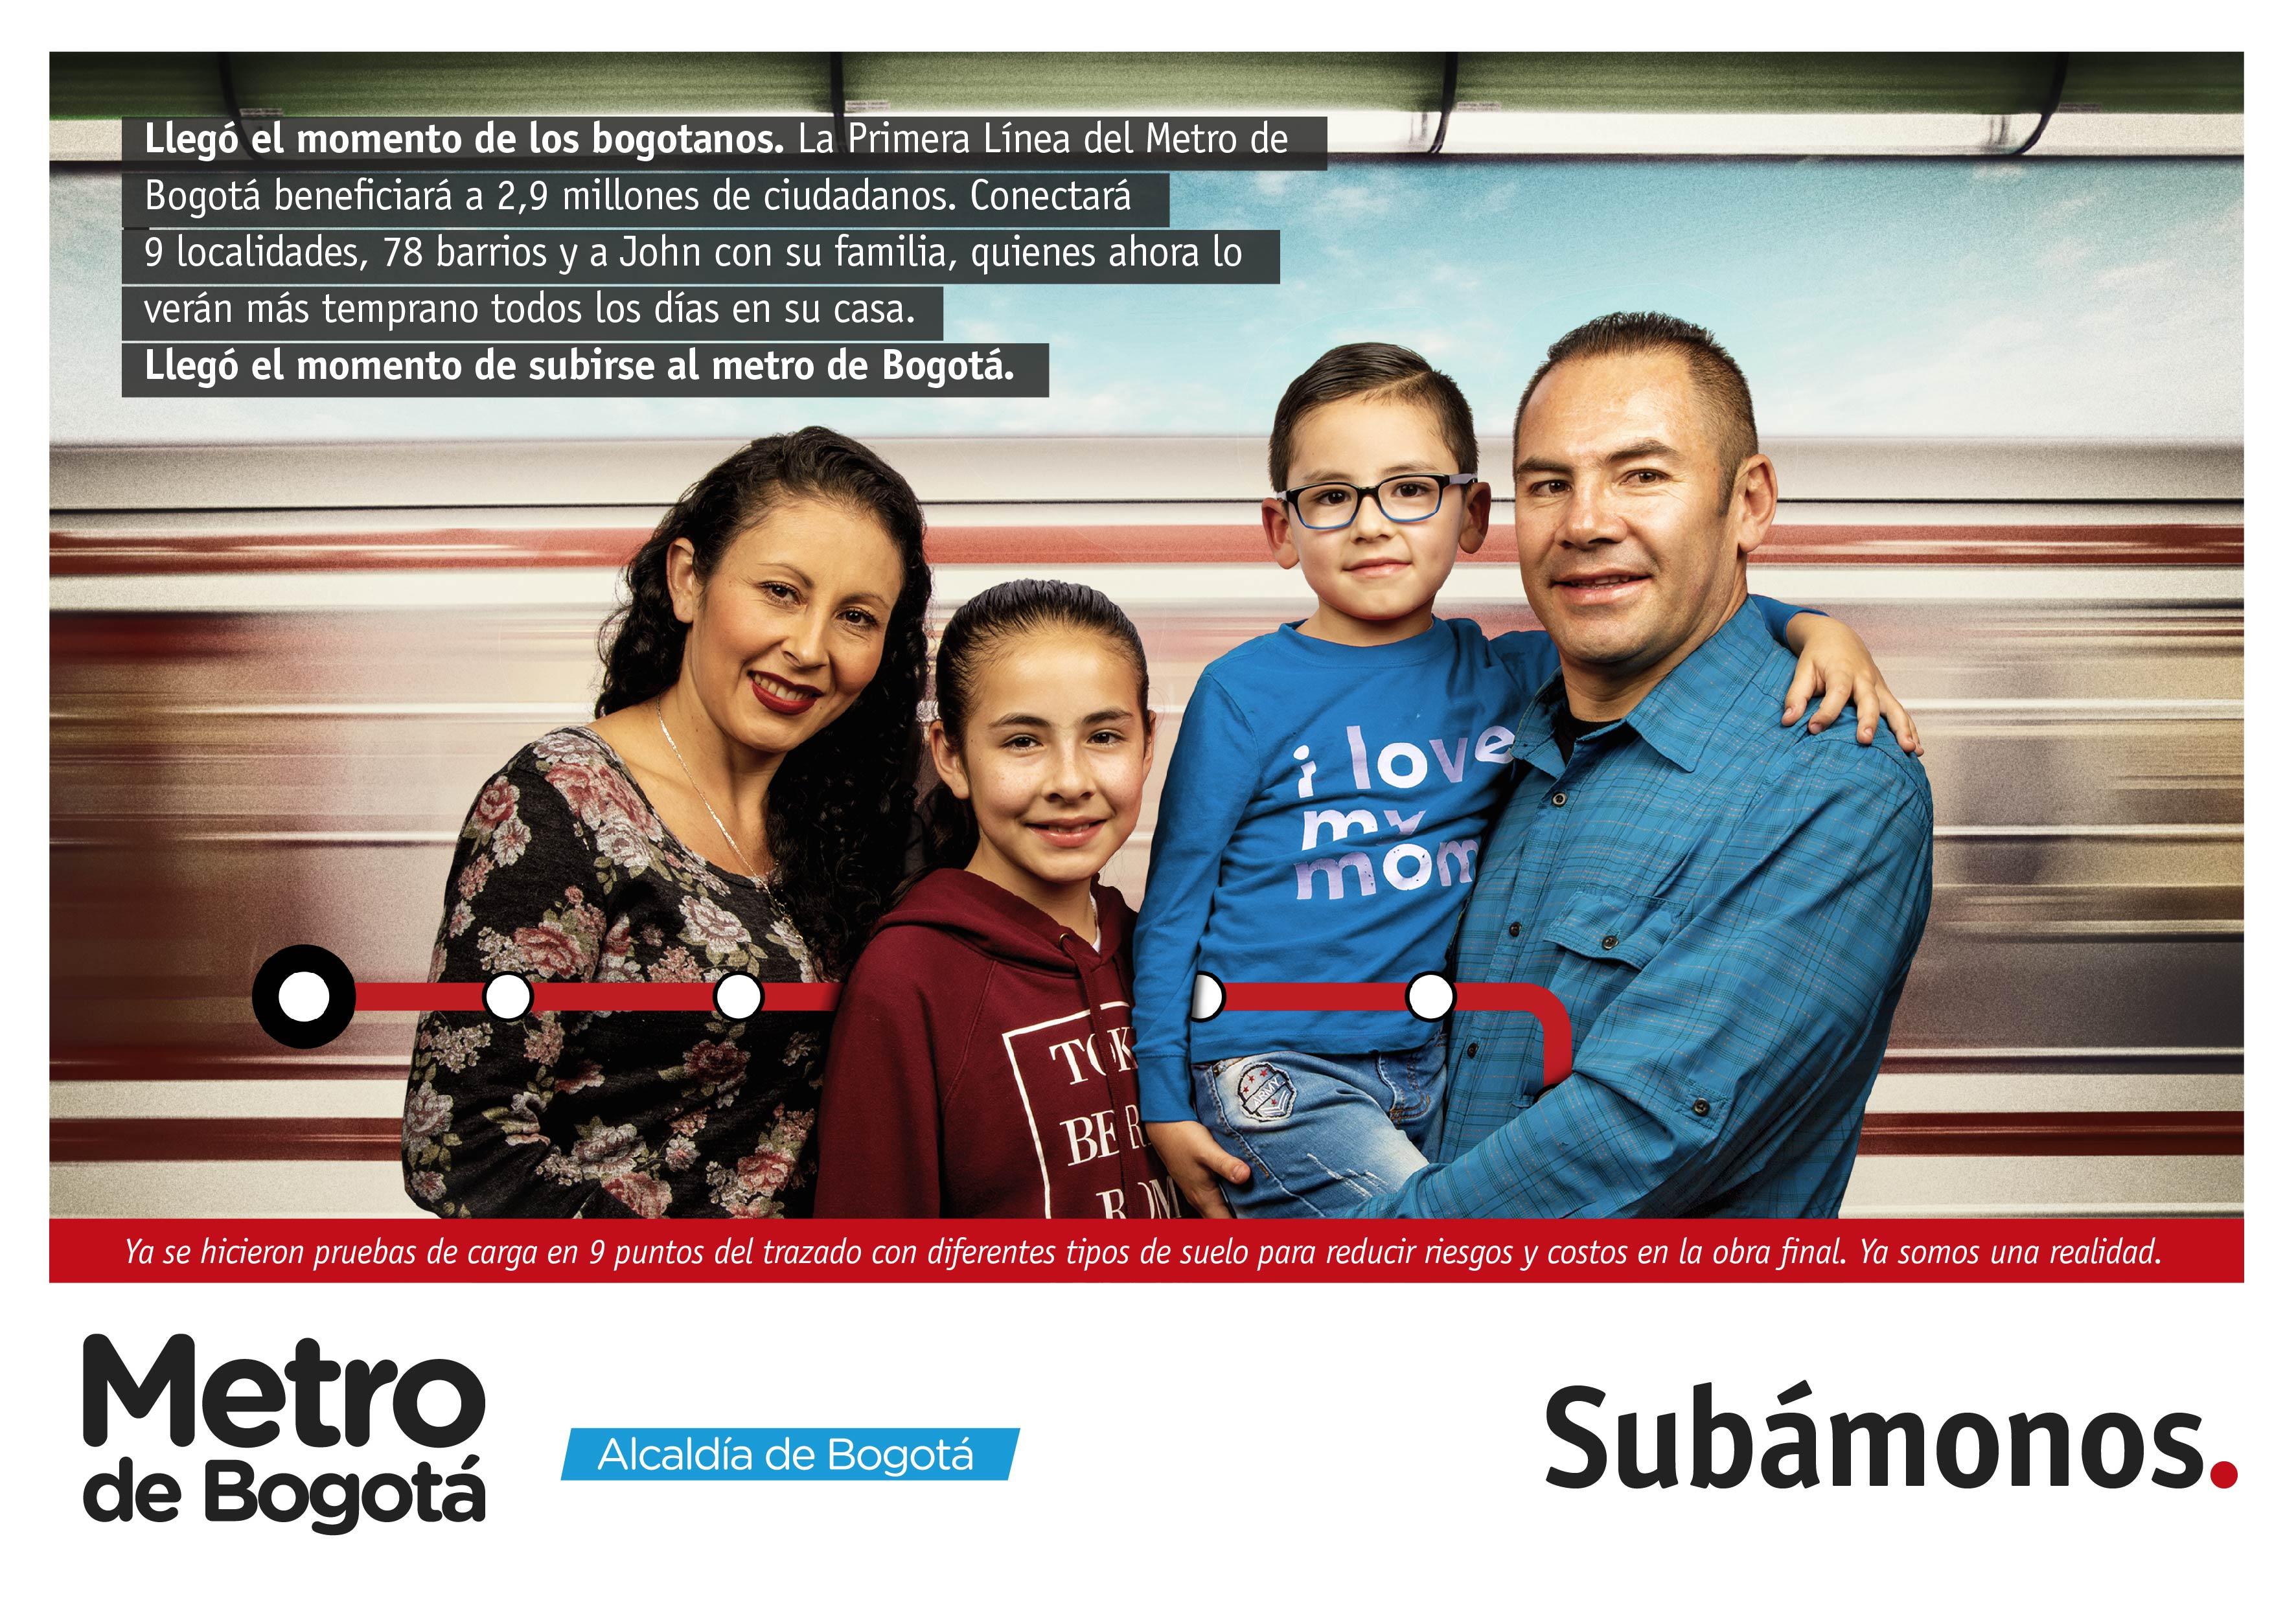 Imagen campaña 1